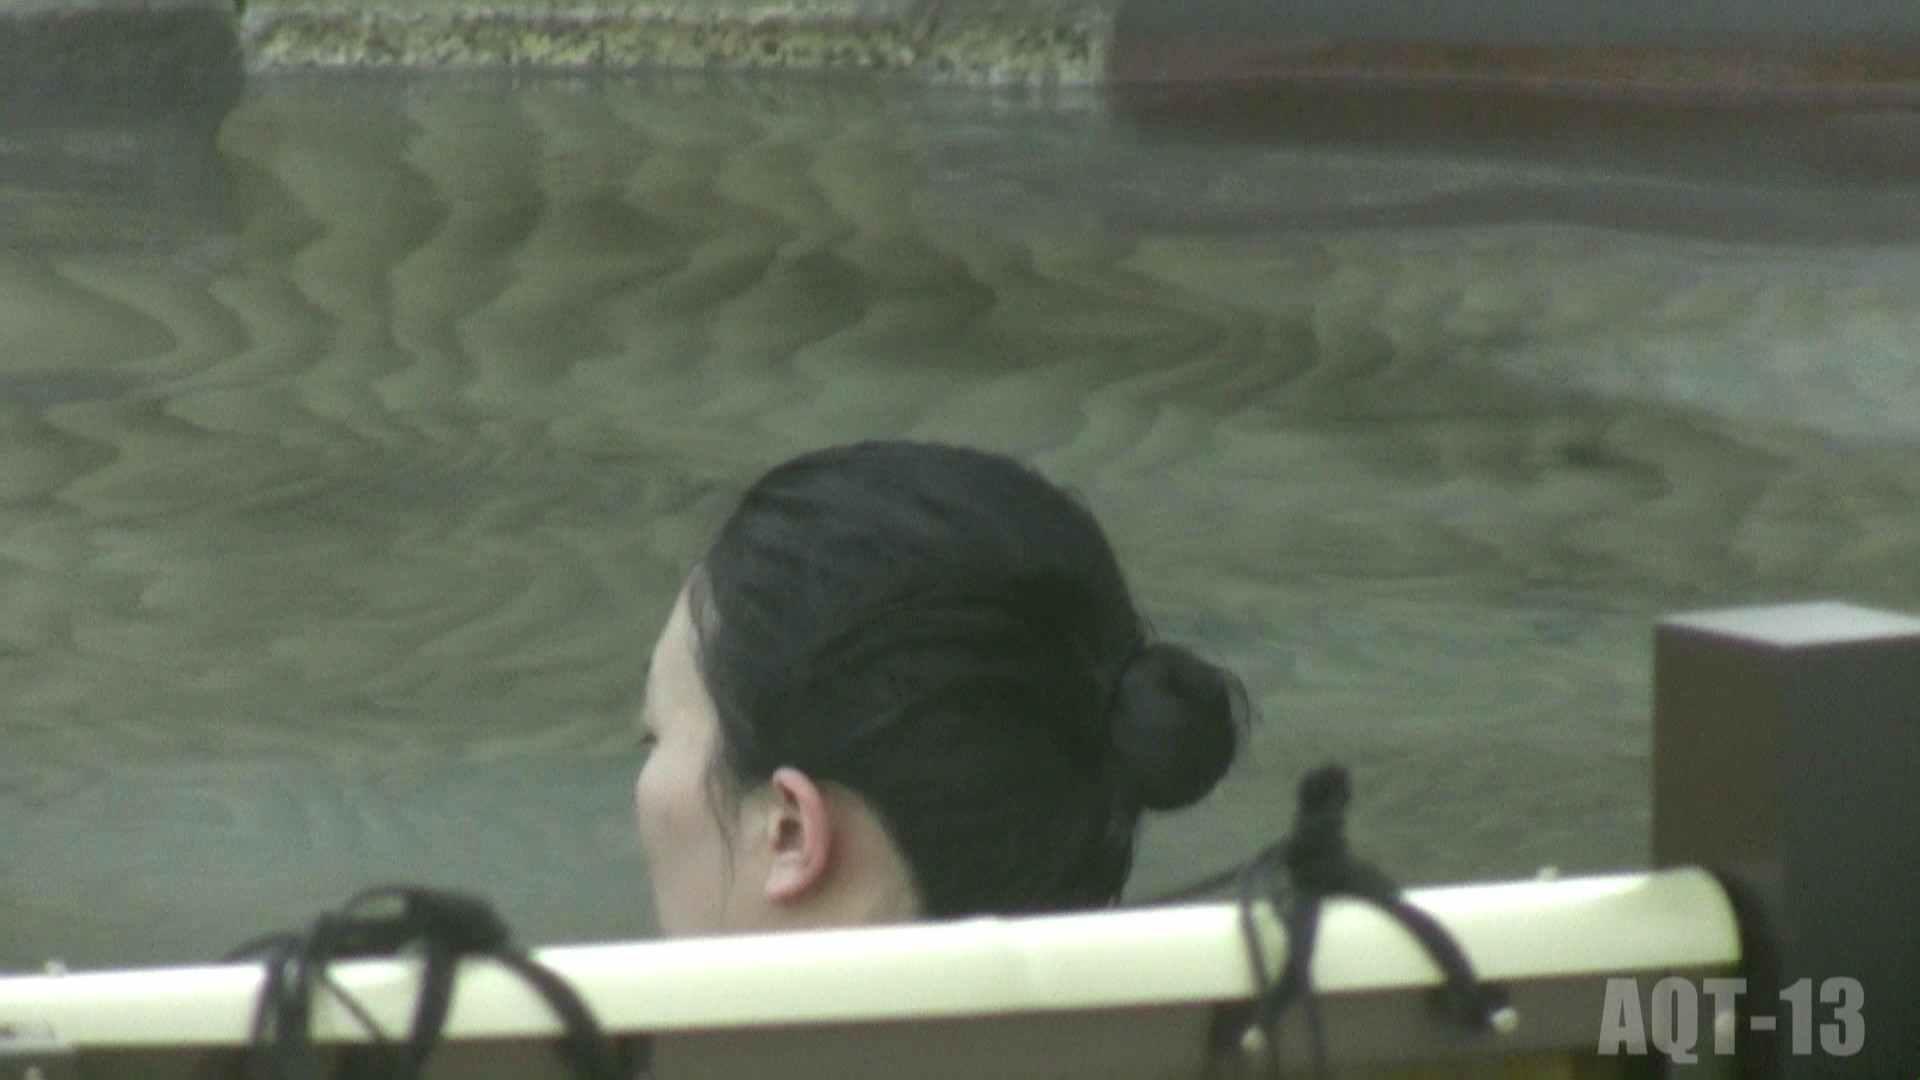 Aquaな露天風呂Vol.818 露天風呂突入 盗み撮り動画キャプチャ 71pic 26